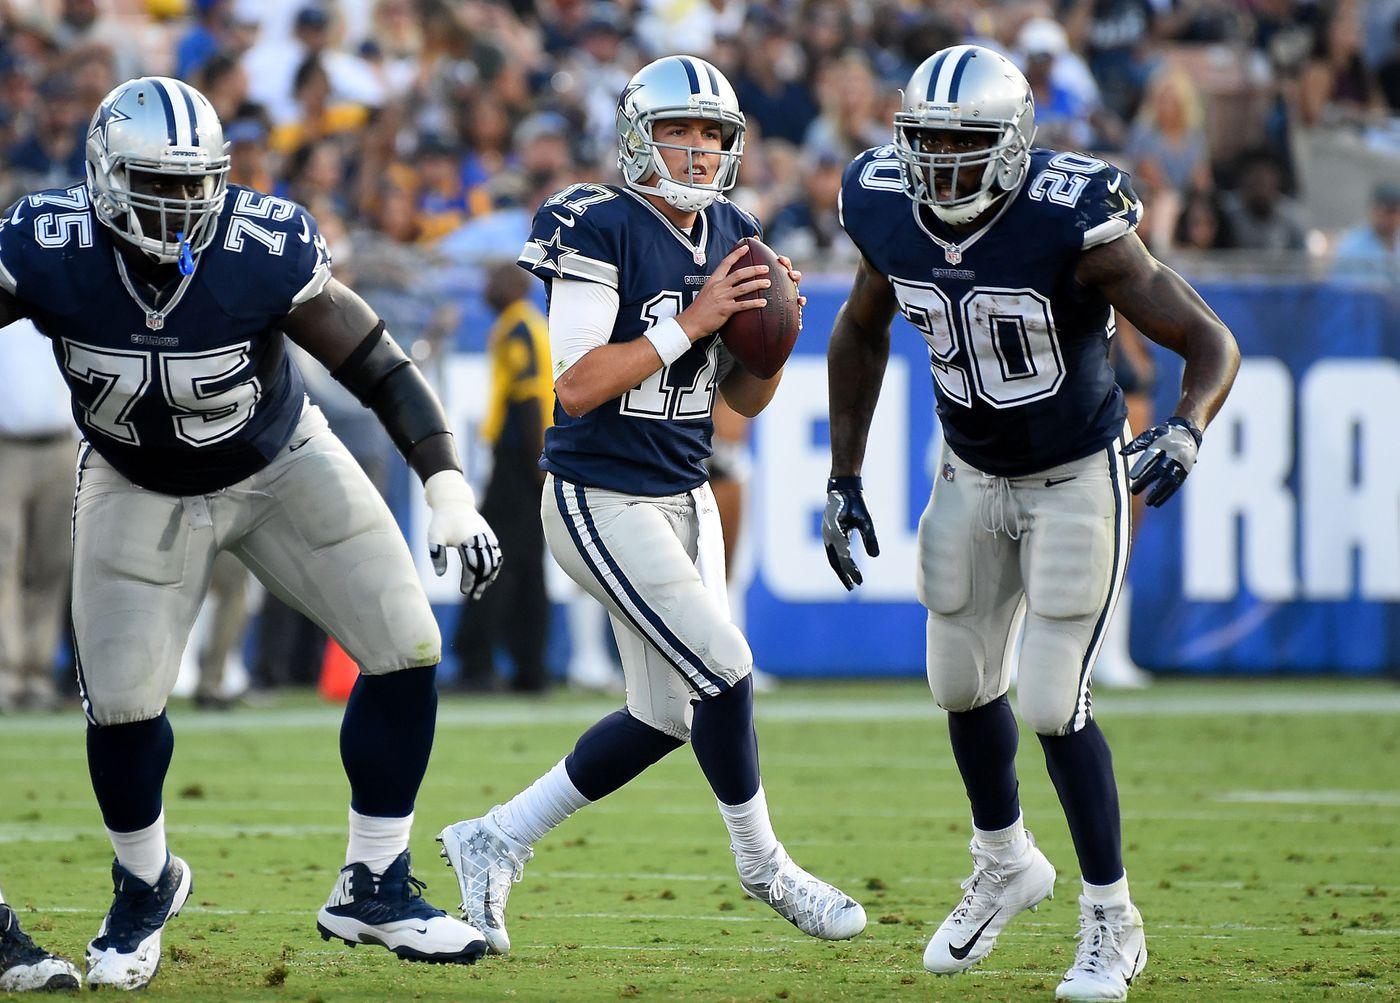 promo code 2a868 af98b Why Arkansas is wearing 'Dallas Cowboys' uniforms vs. Texas ...